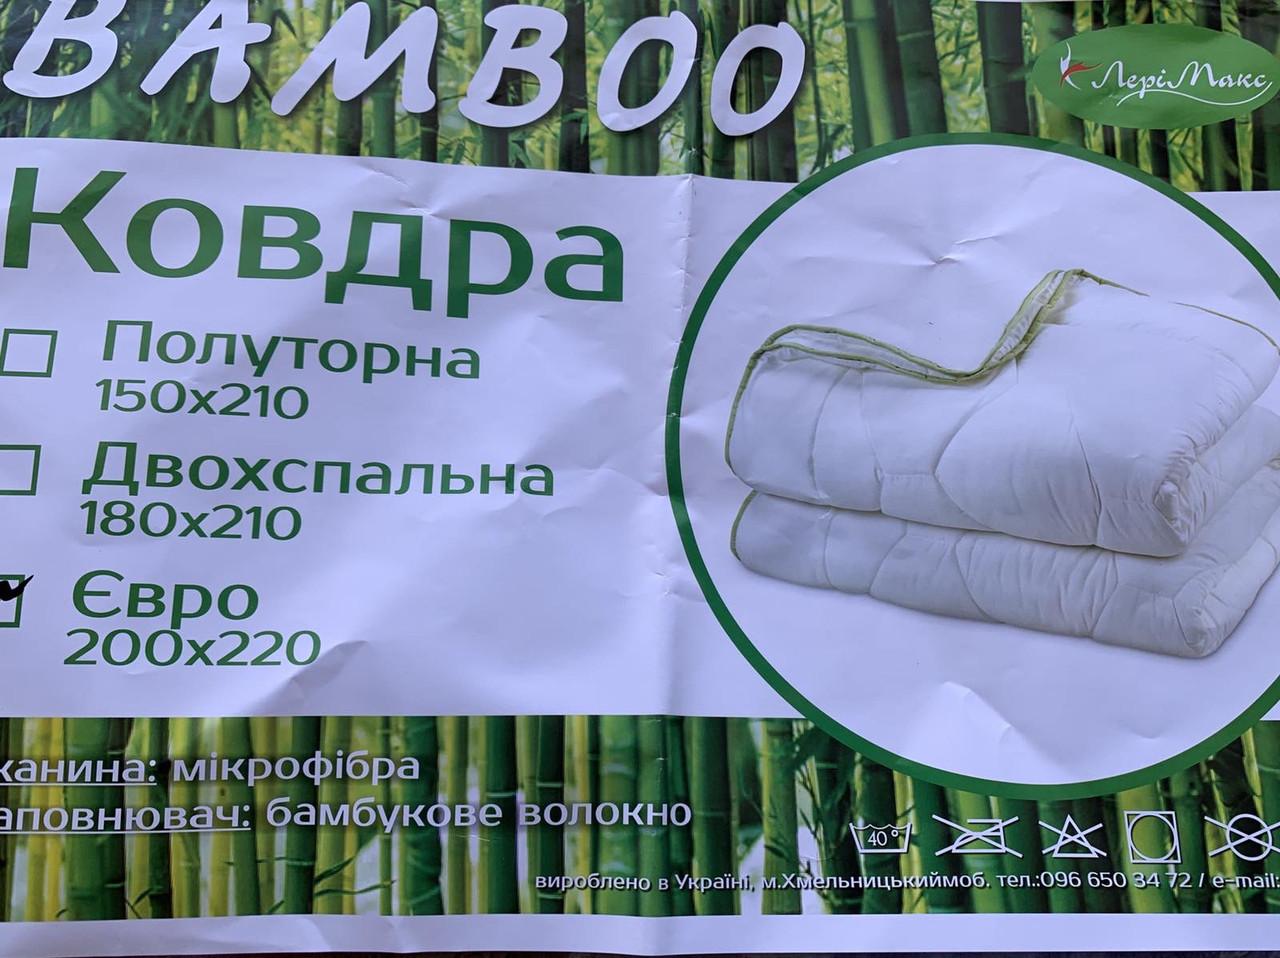 Одеяло бамбук// Одеяло Евро // Одеяло из бамбукового волокна стёганое